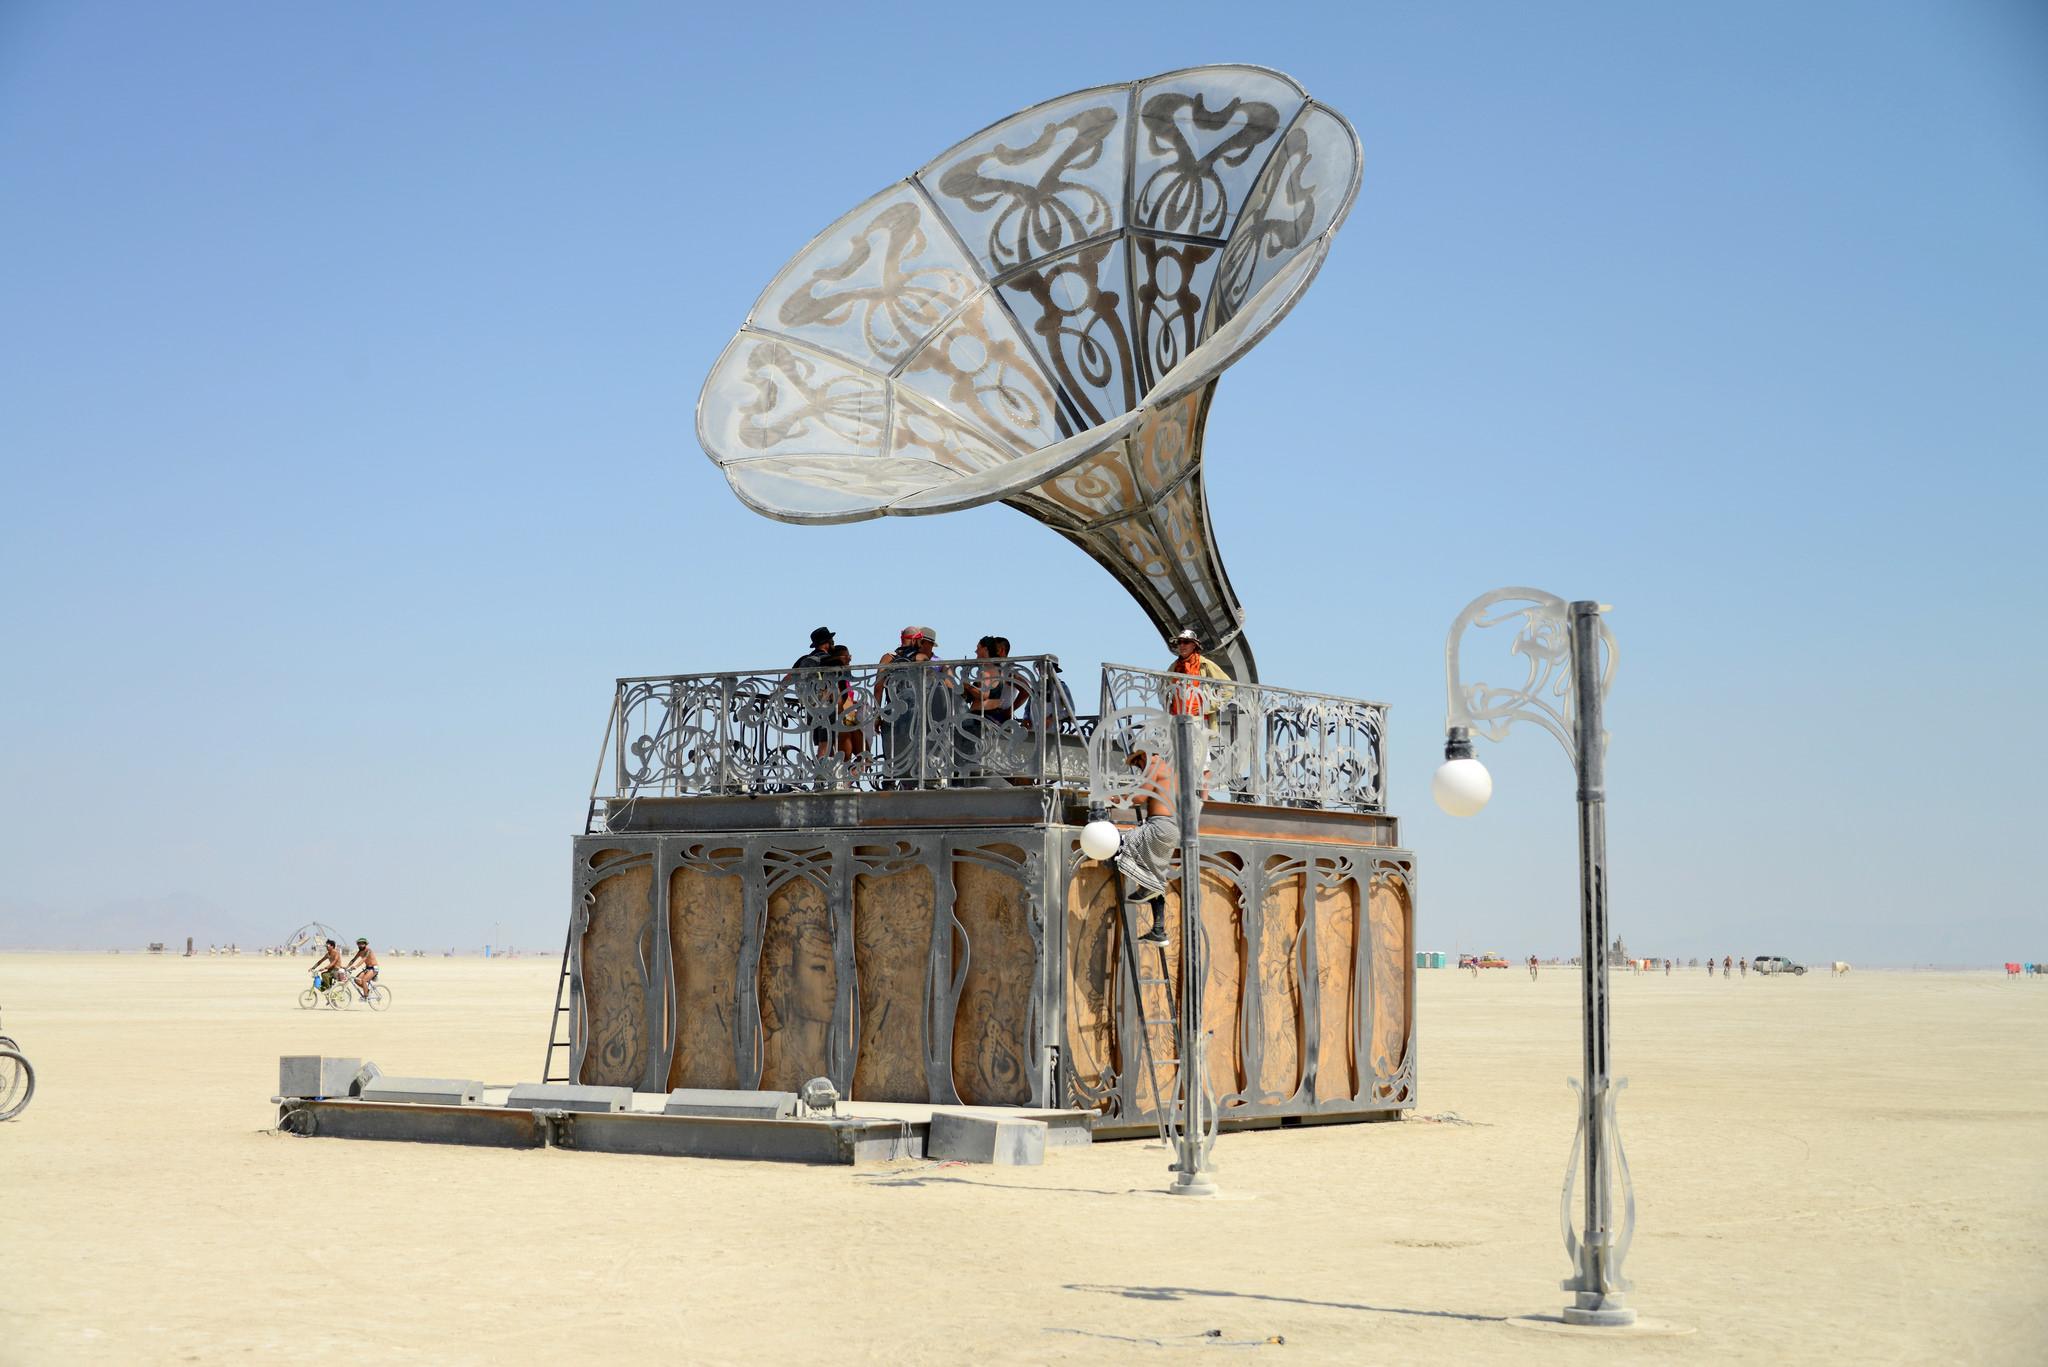 Scene of art sculpture from Burning Man 2017.